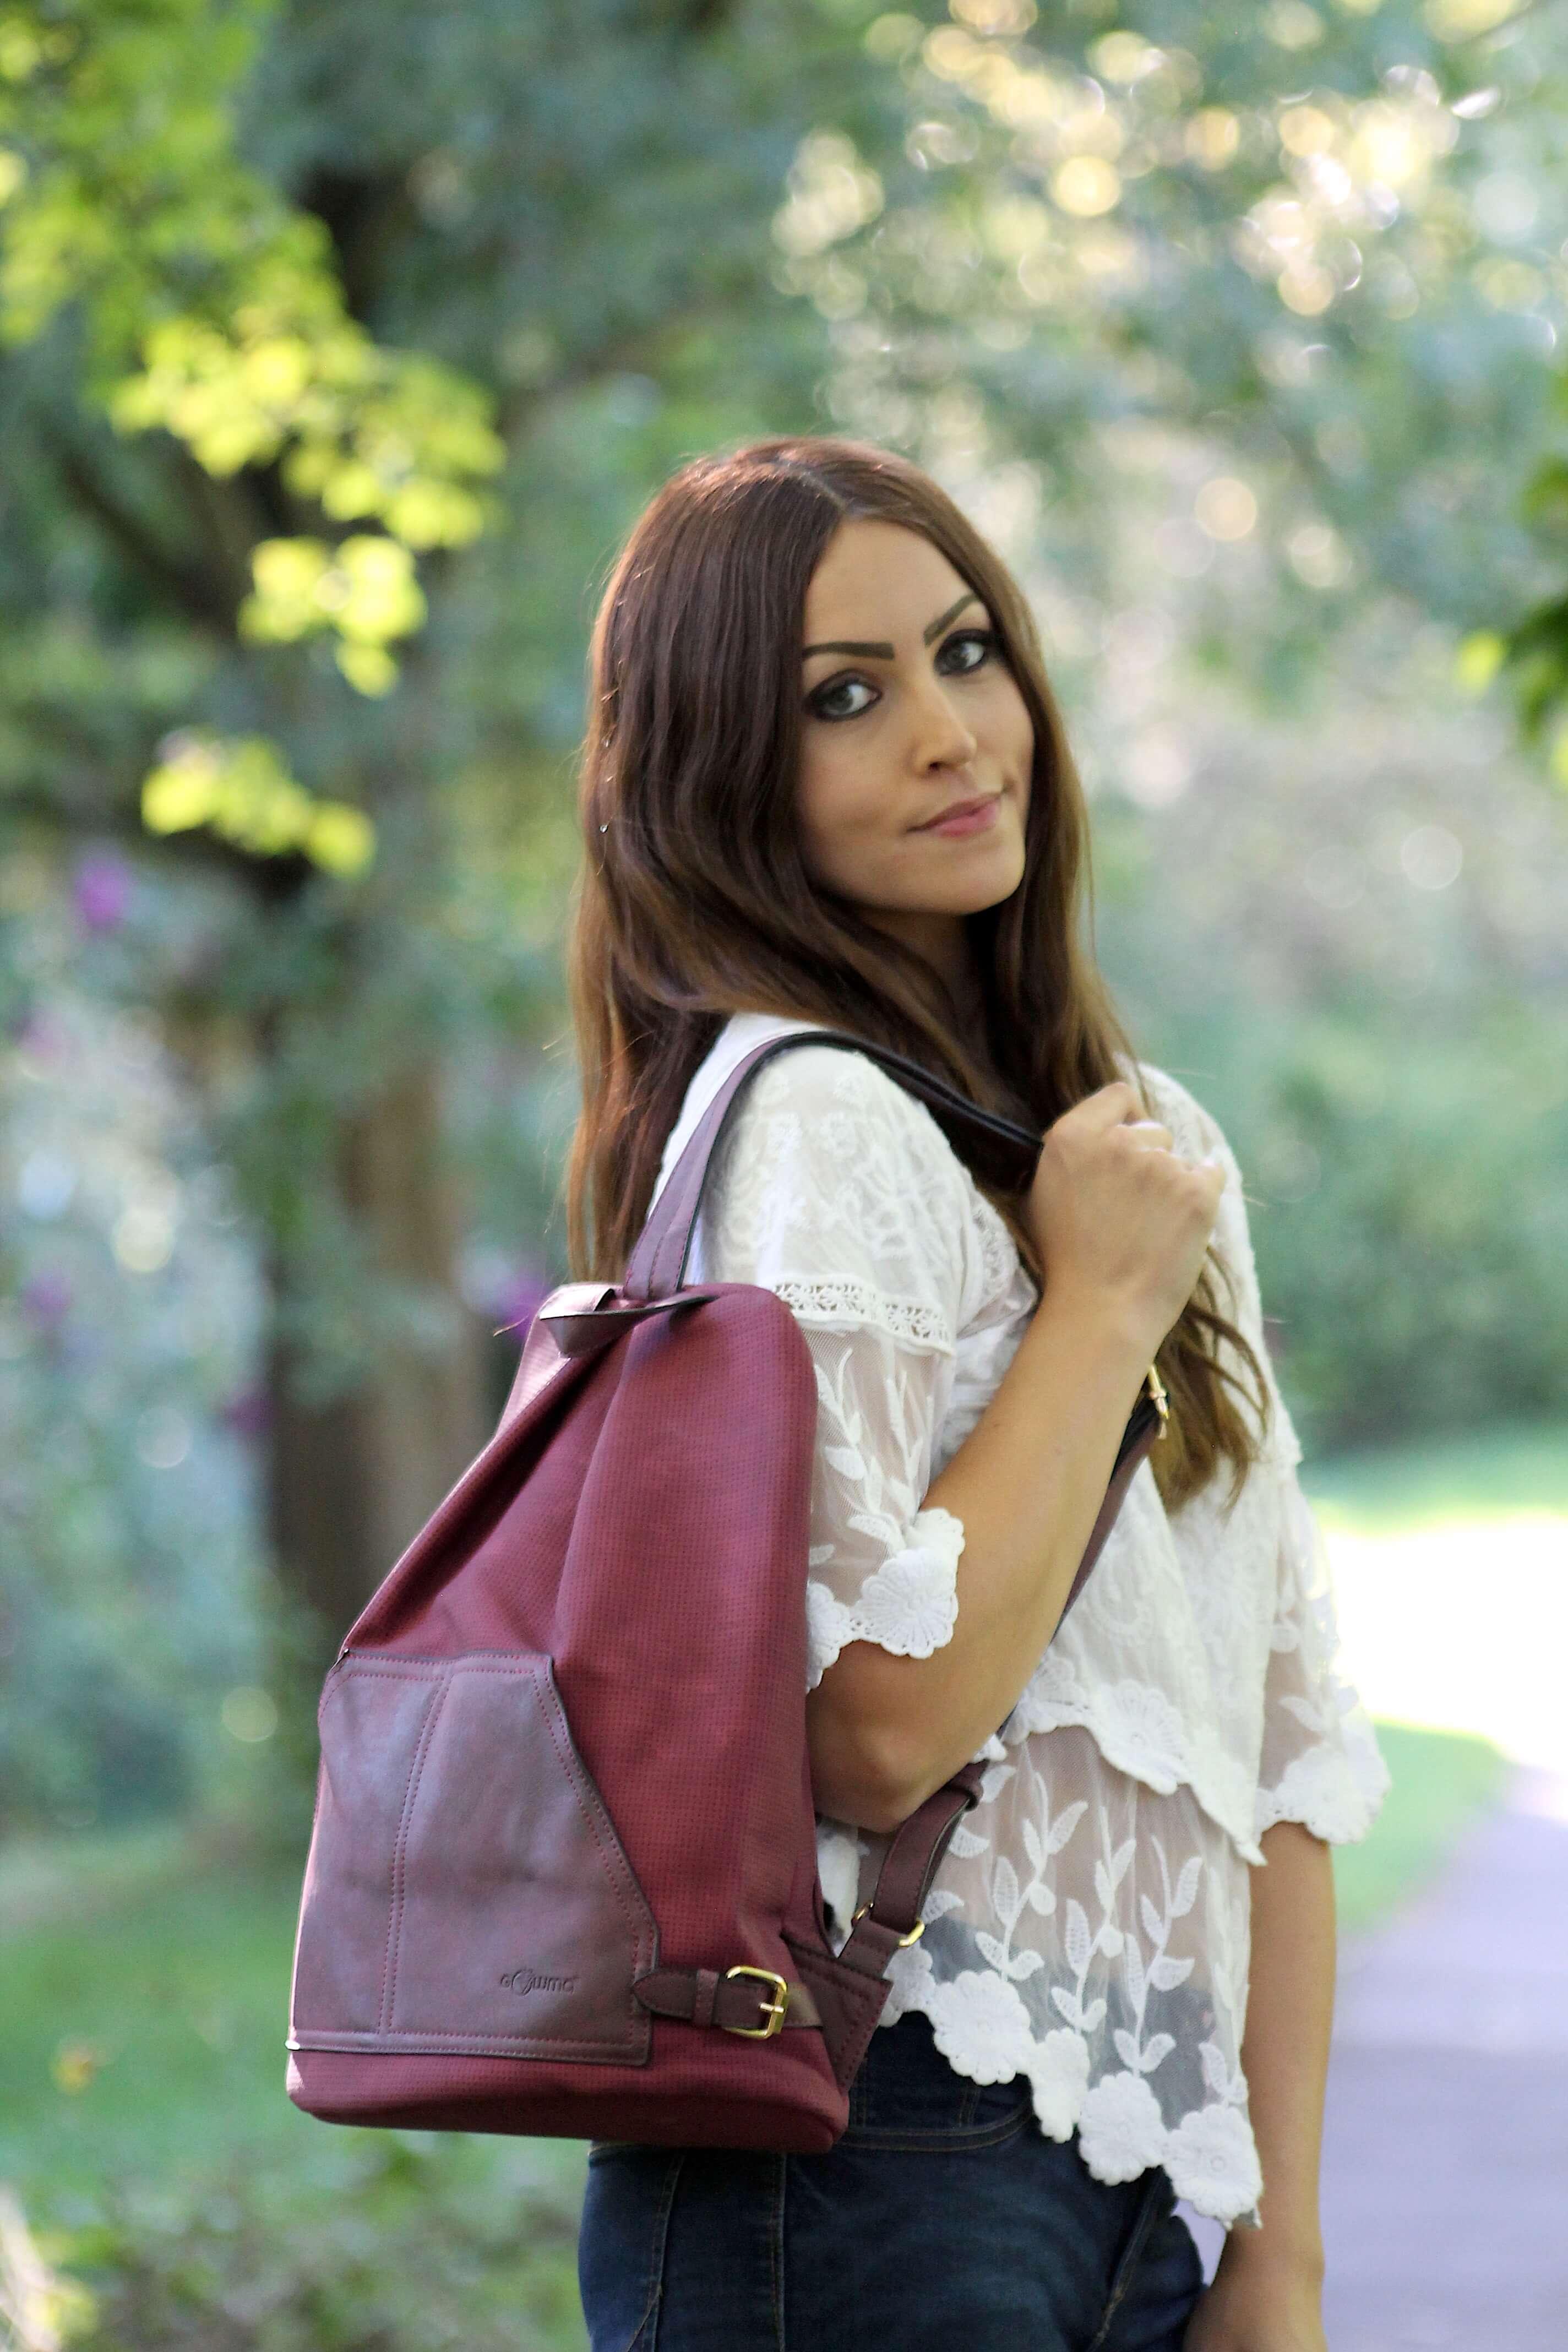 vegan backpacks-LIFESTYLE INTERNATIONAL LIMITED..JPG 1